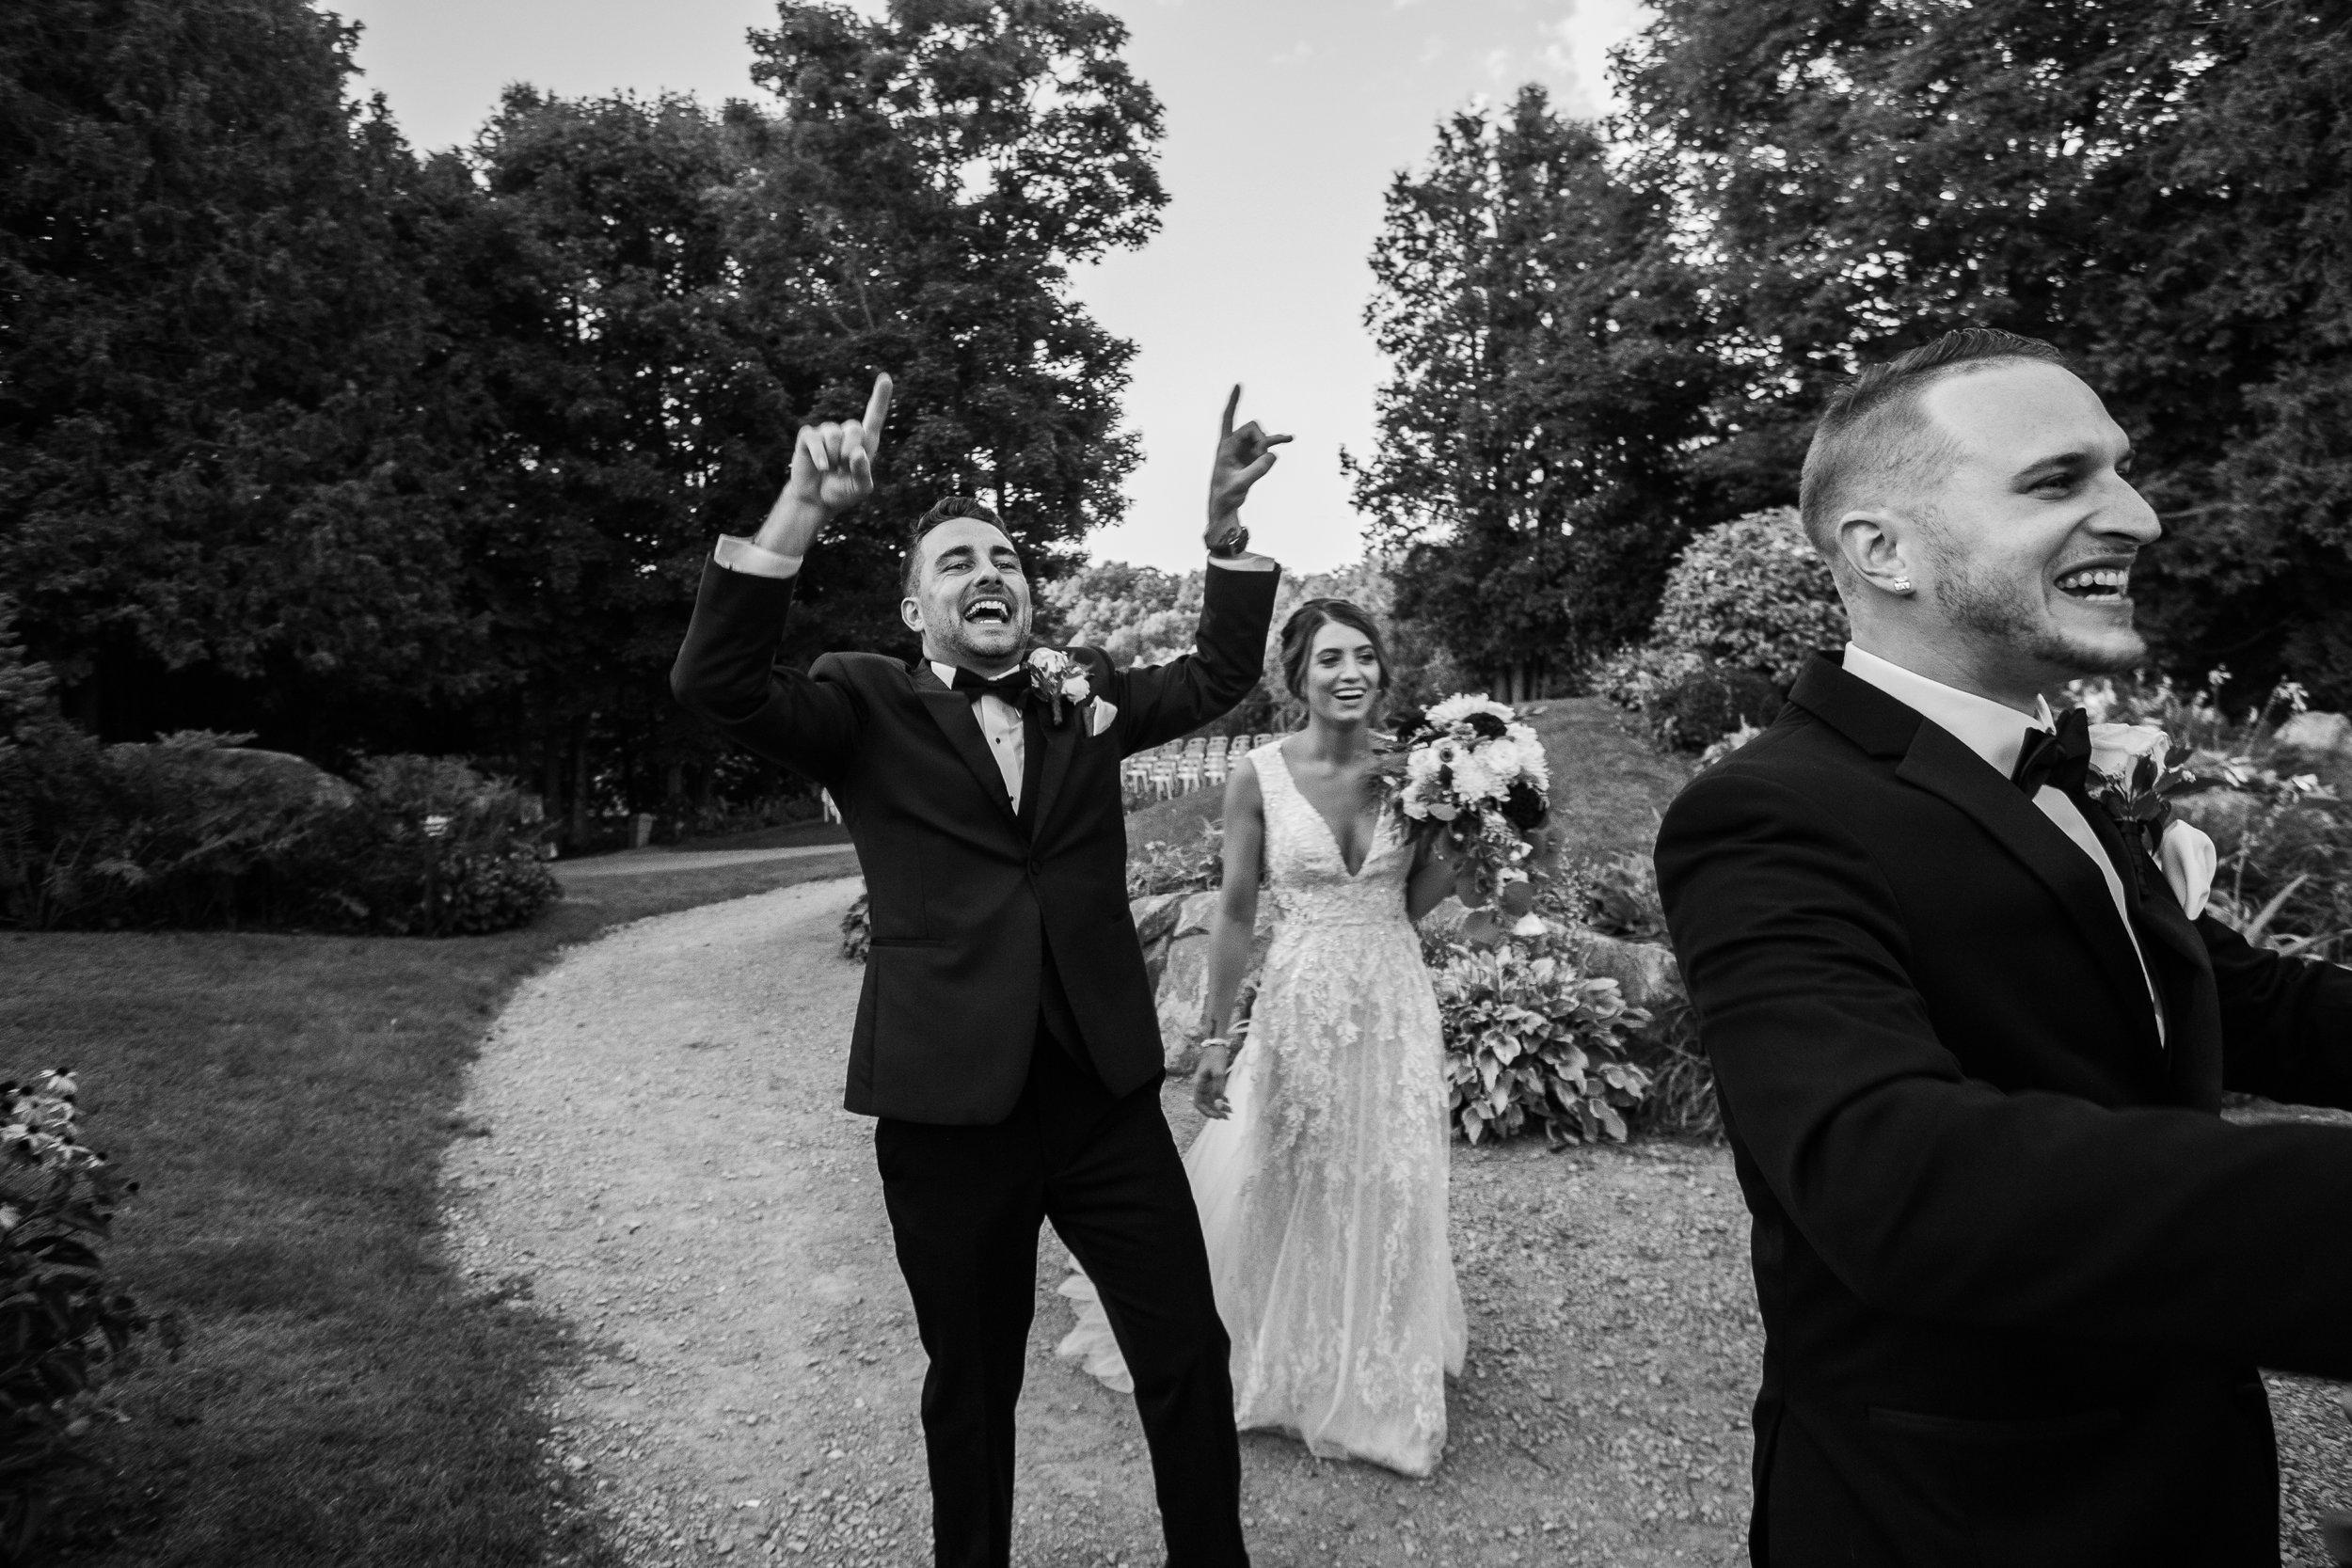 Claremont_fourseasons_Wedding-430.jpg